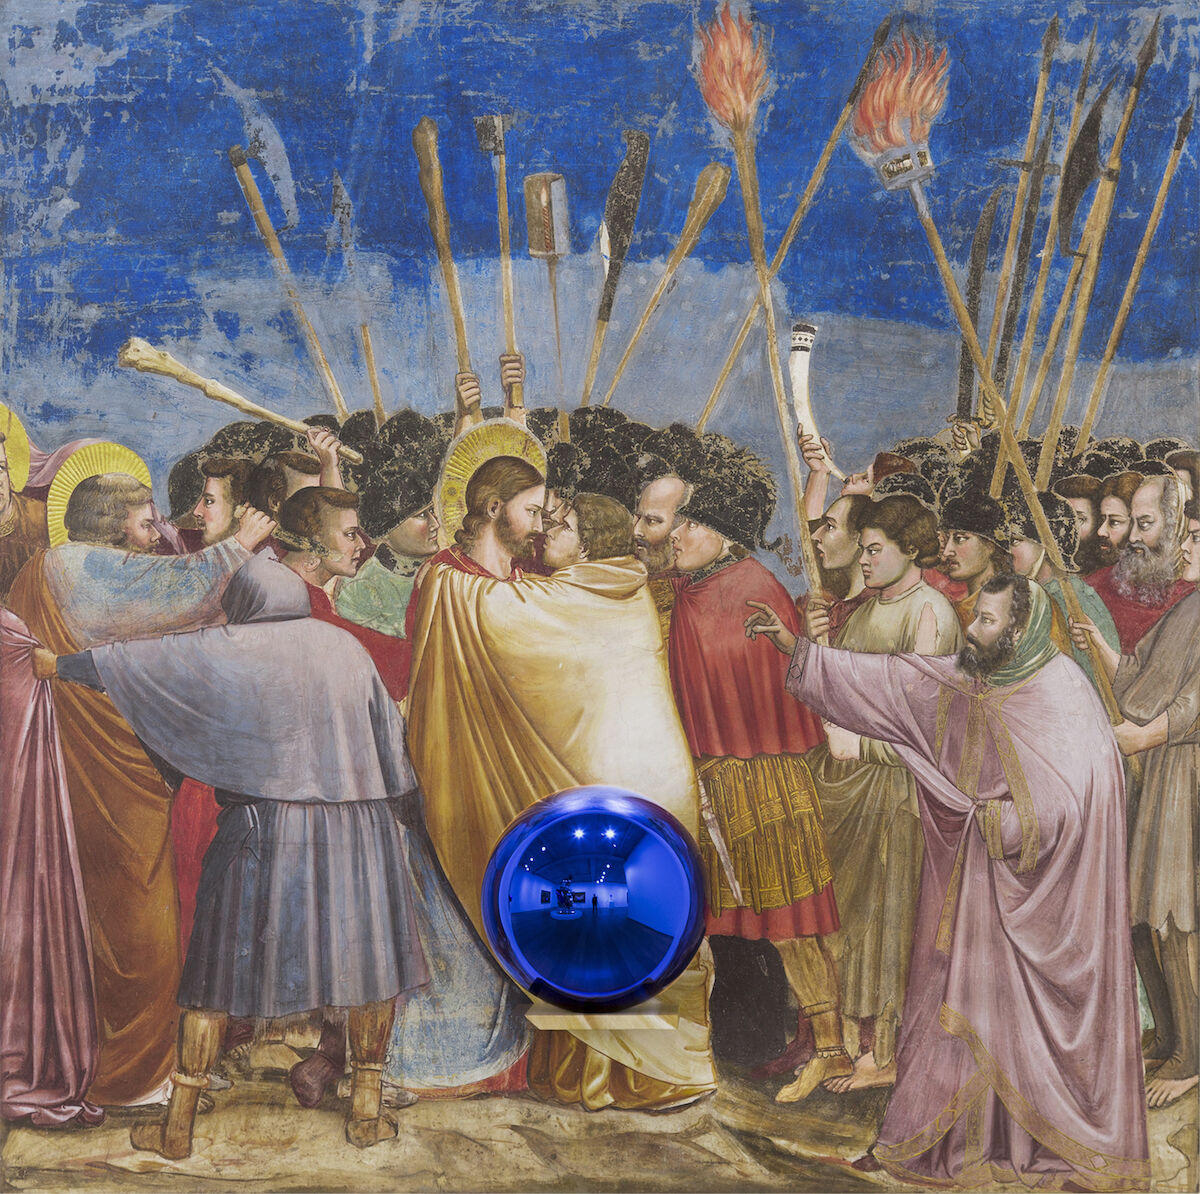 Jeff Koons, Gazing Ball (Giotto The Kiss of Judas), 2015-2016. © Jeff Koons. Courtesy David Zwirner, New York.